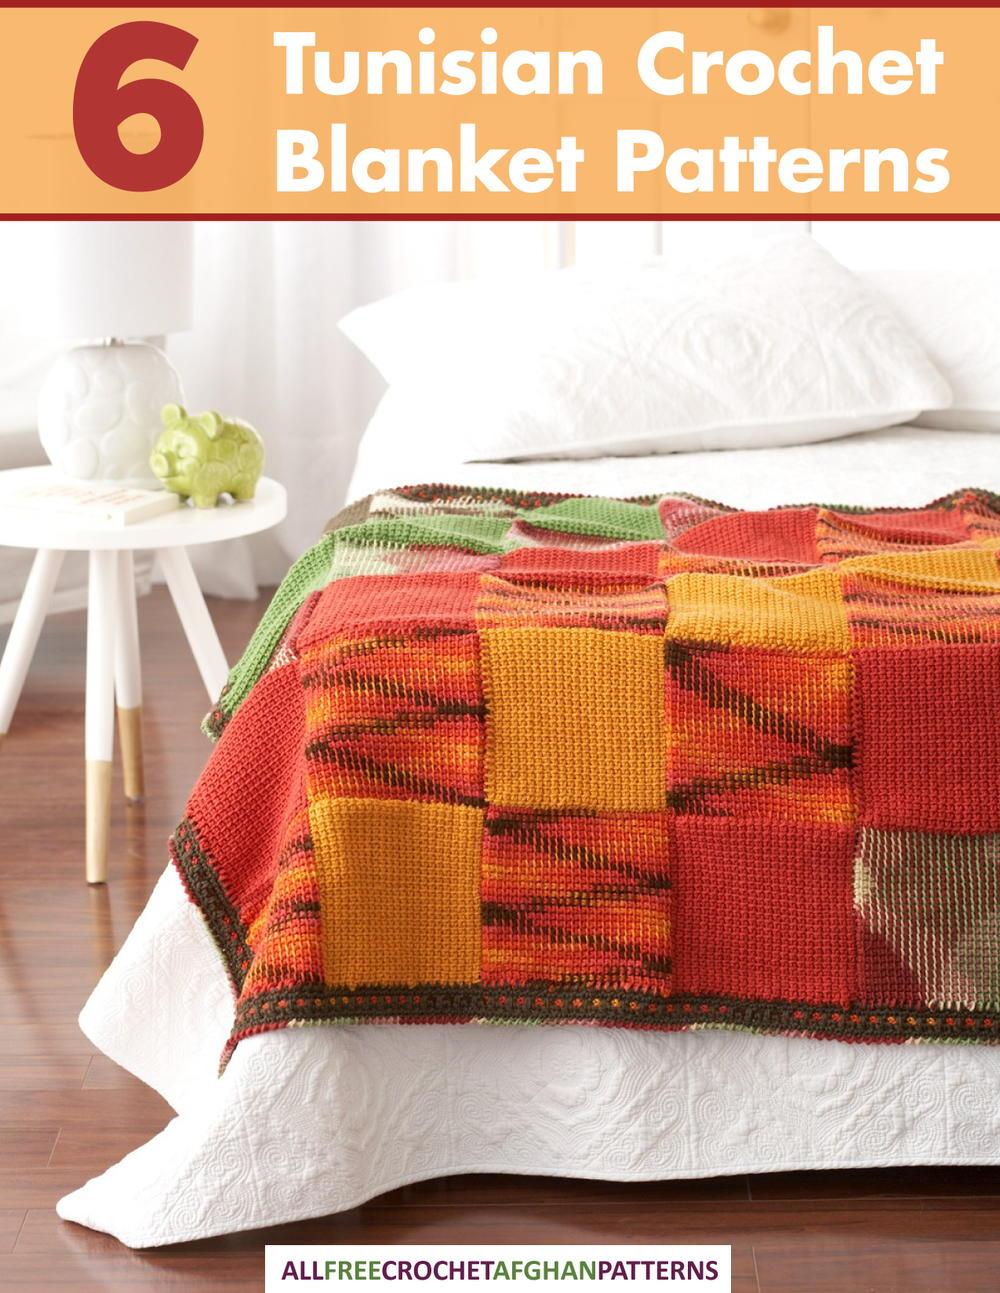 6 Tunisian Crochet Blanket Patterns Free Ebook Allfreecrochetafghanpatterns Com